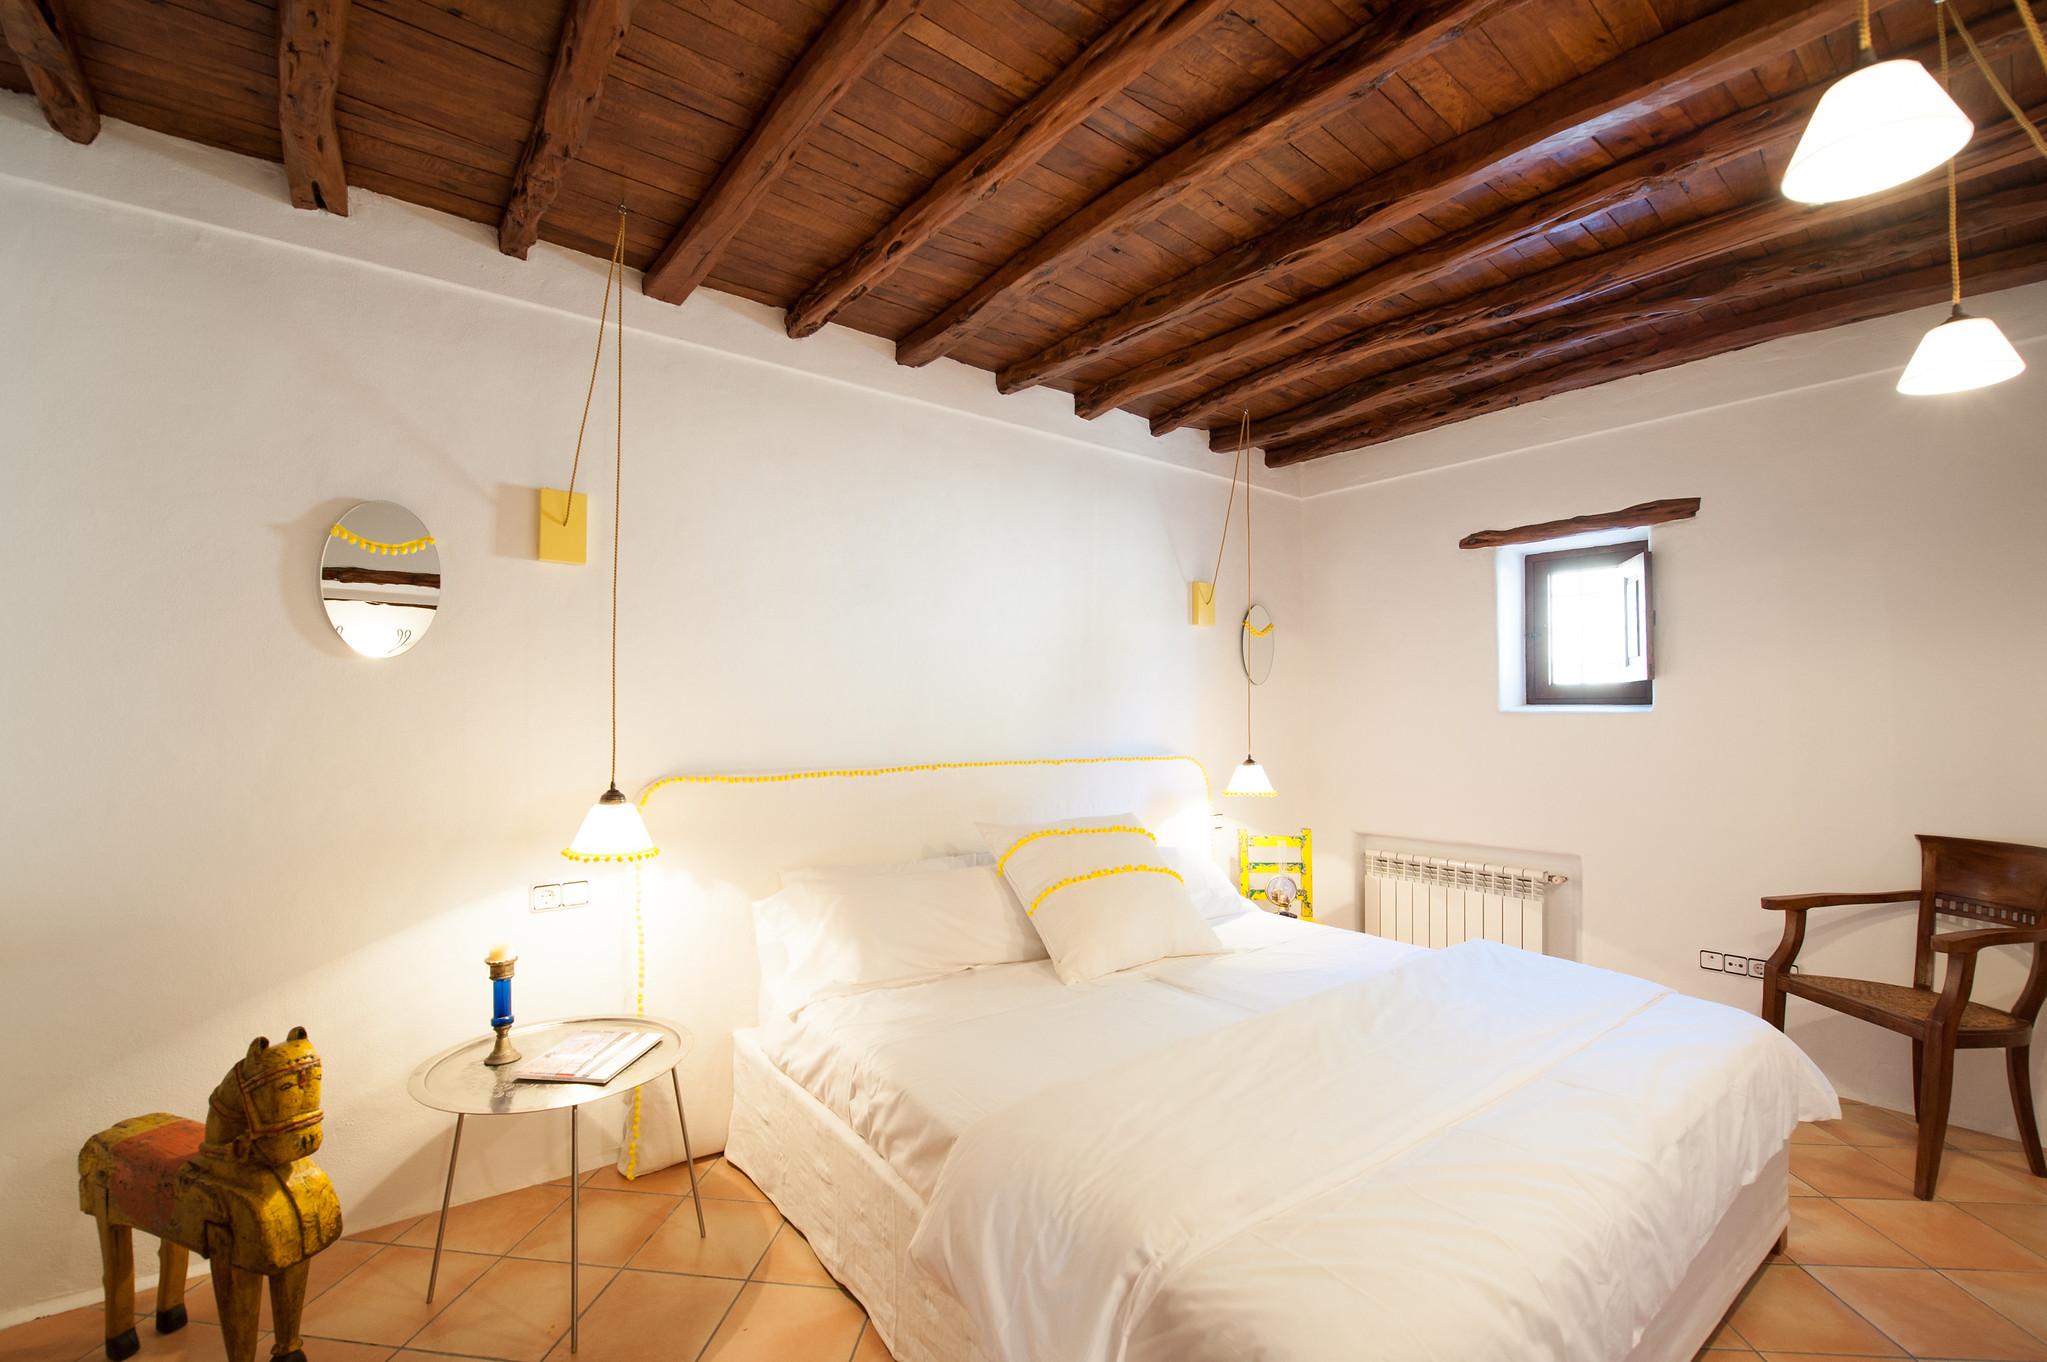 https://www.white-ibiza.com/wp-content/uploads/2020/06/white-ibiza-villas-can-blay-interior-bedroom.jpg